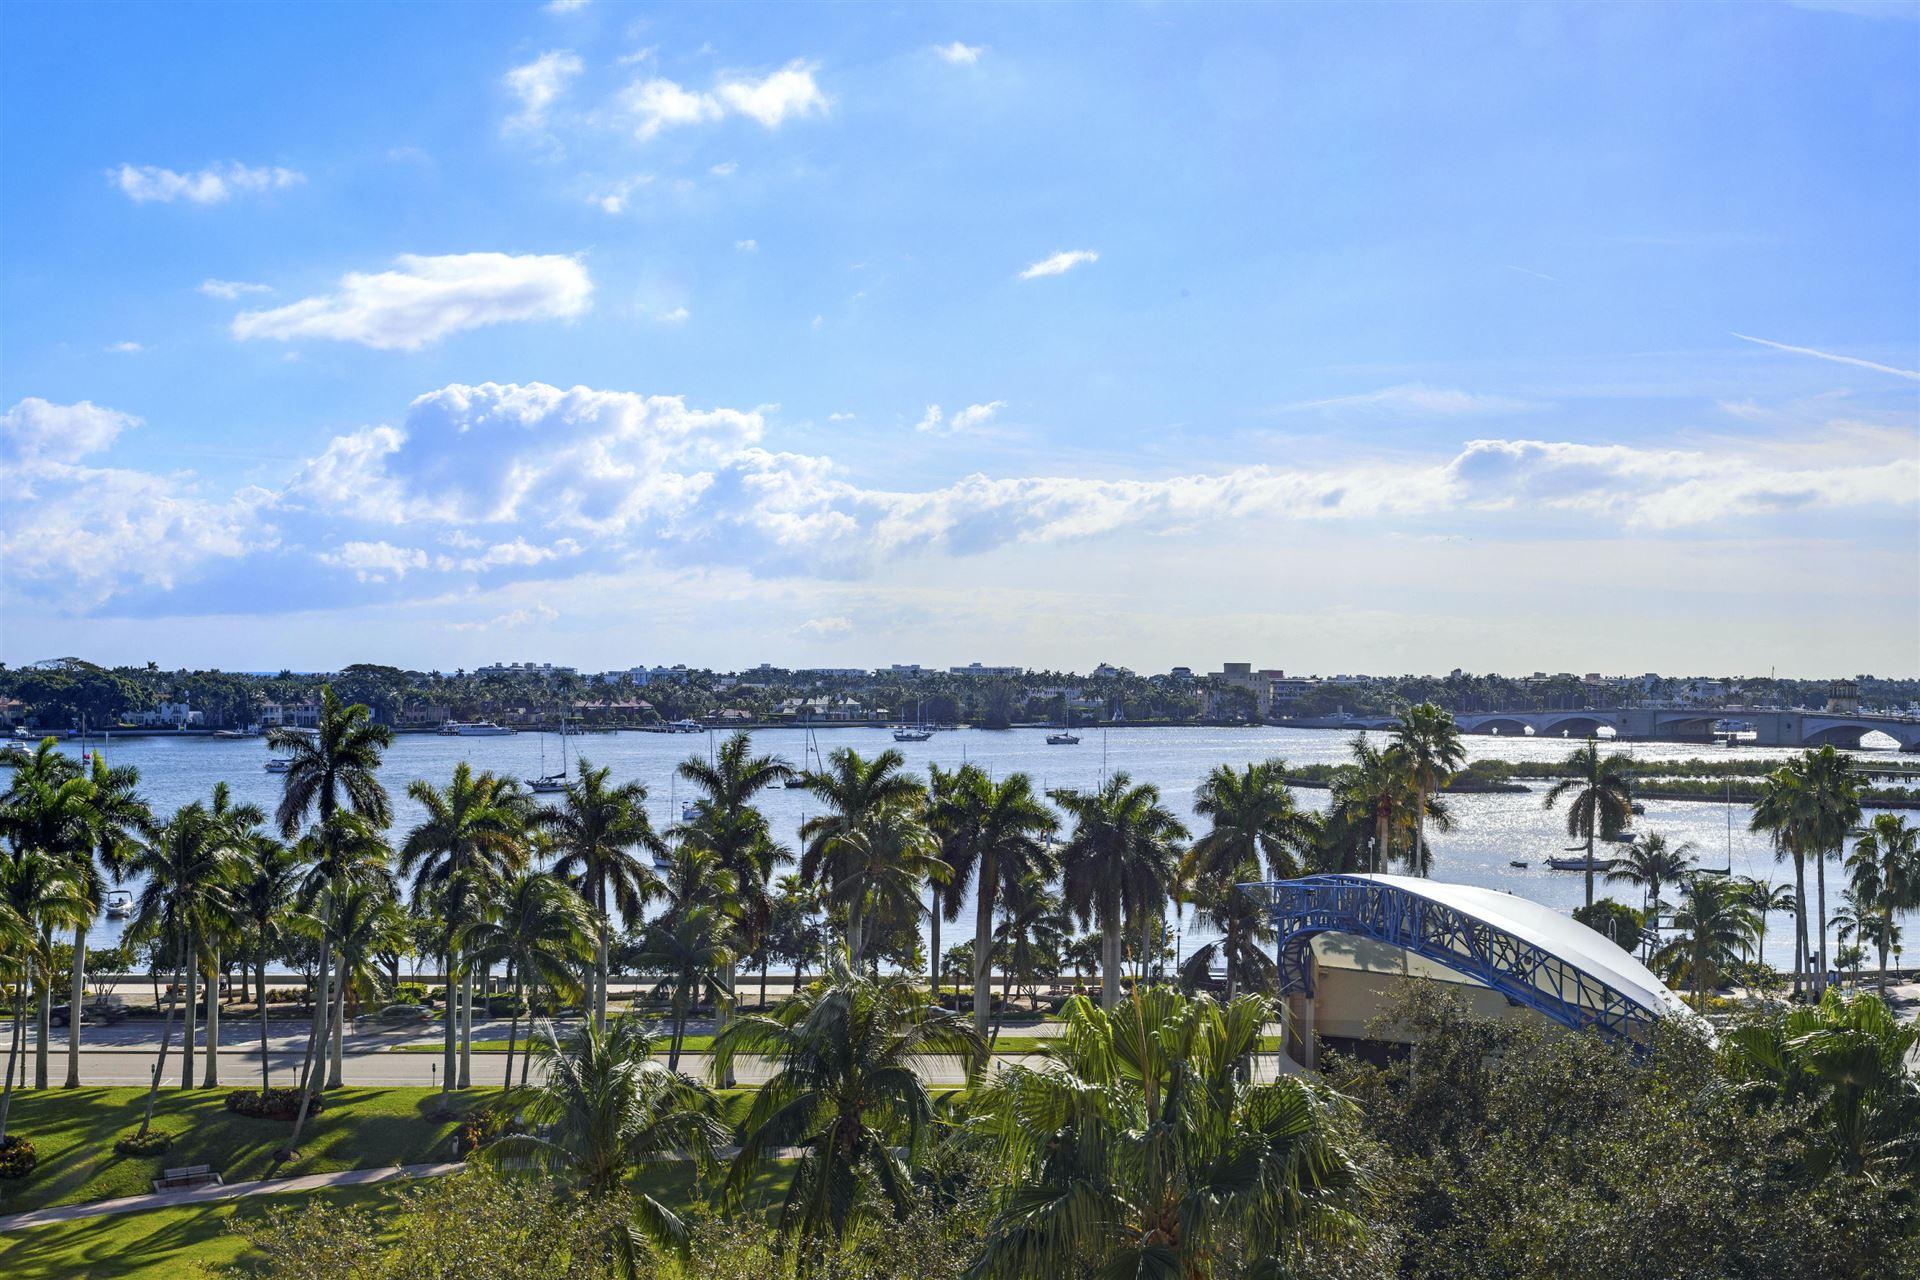 201 S Narcissus Avenue #504, West Palm Beach, FL 33401 - #: RX-10593142